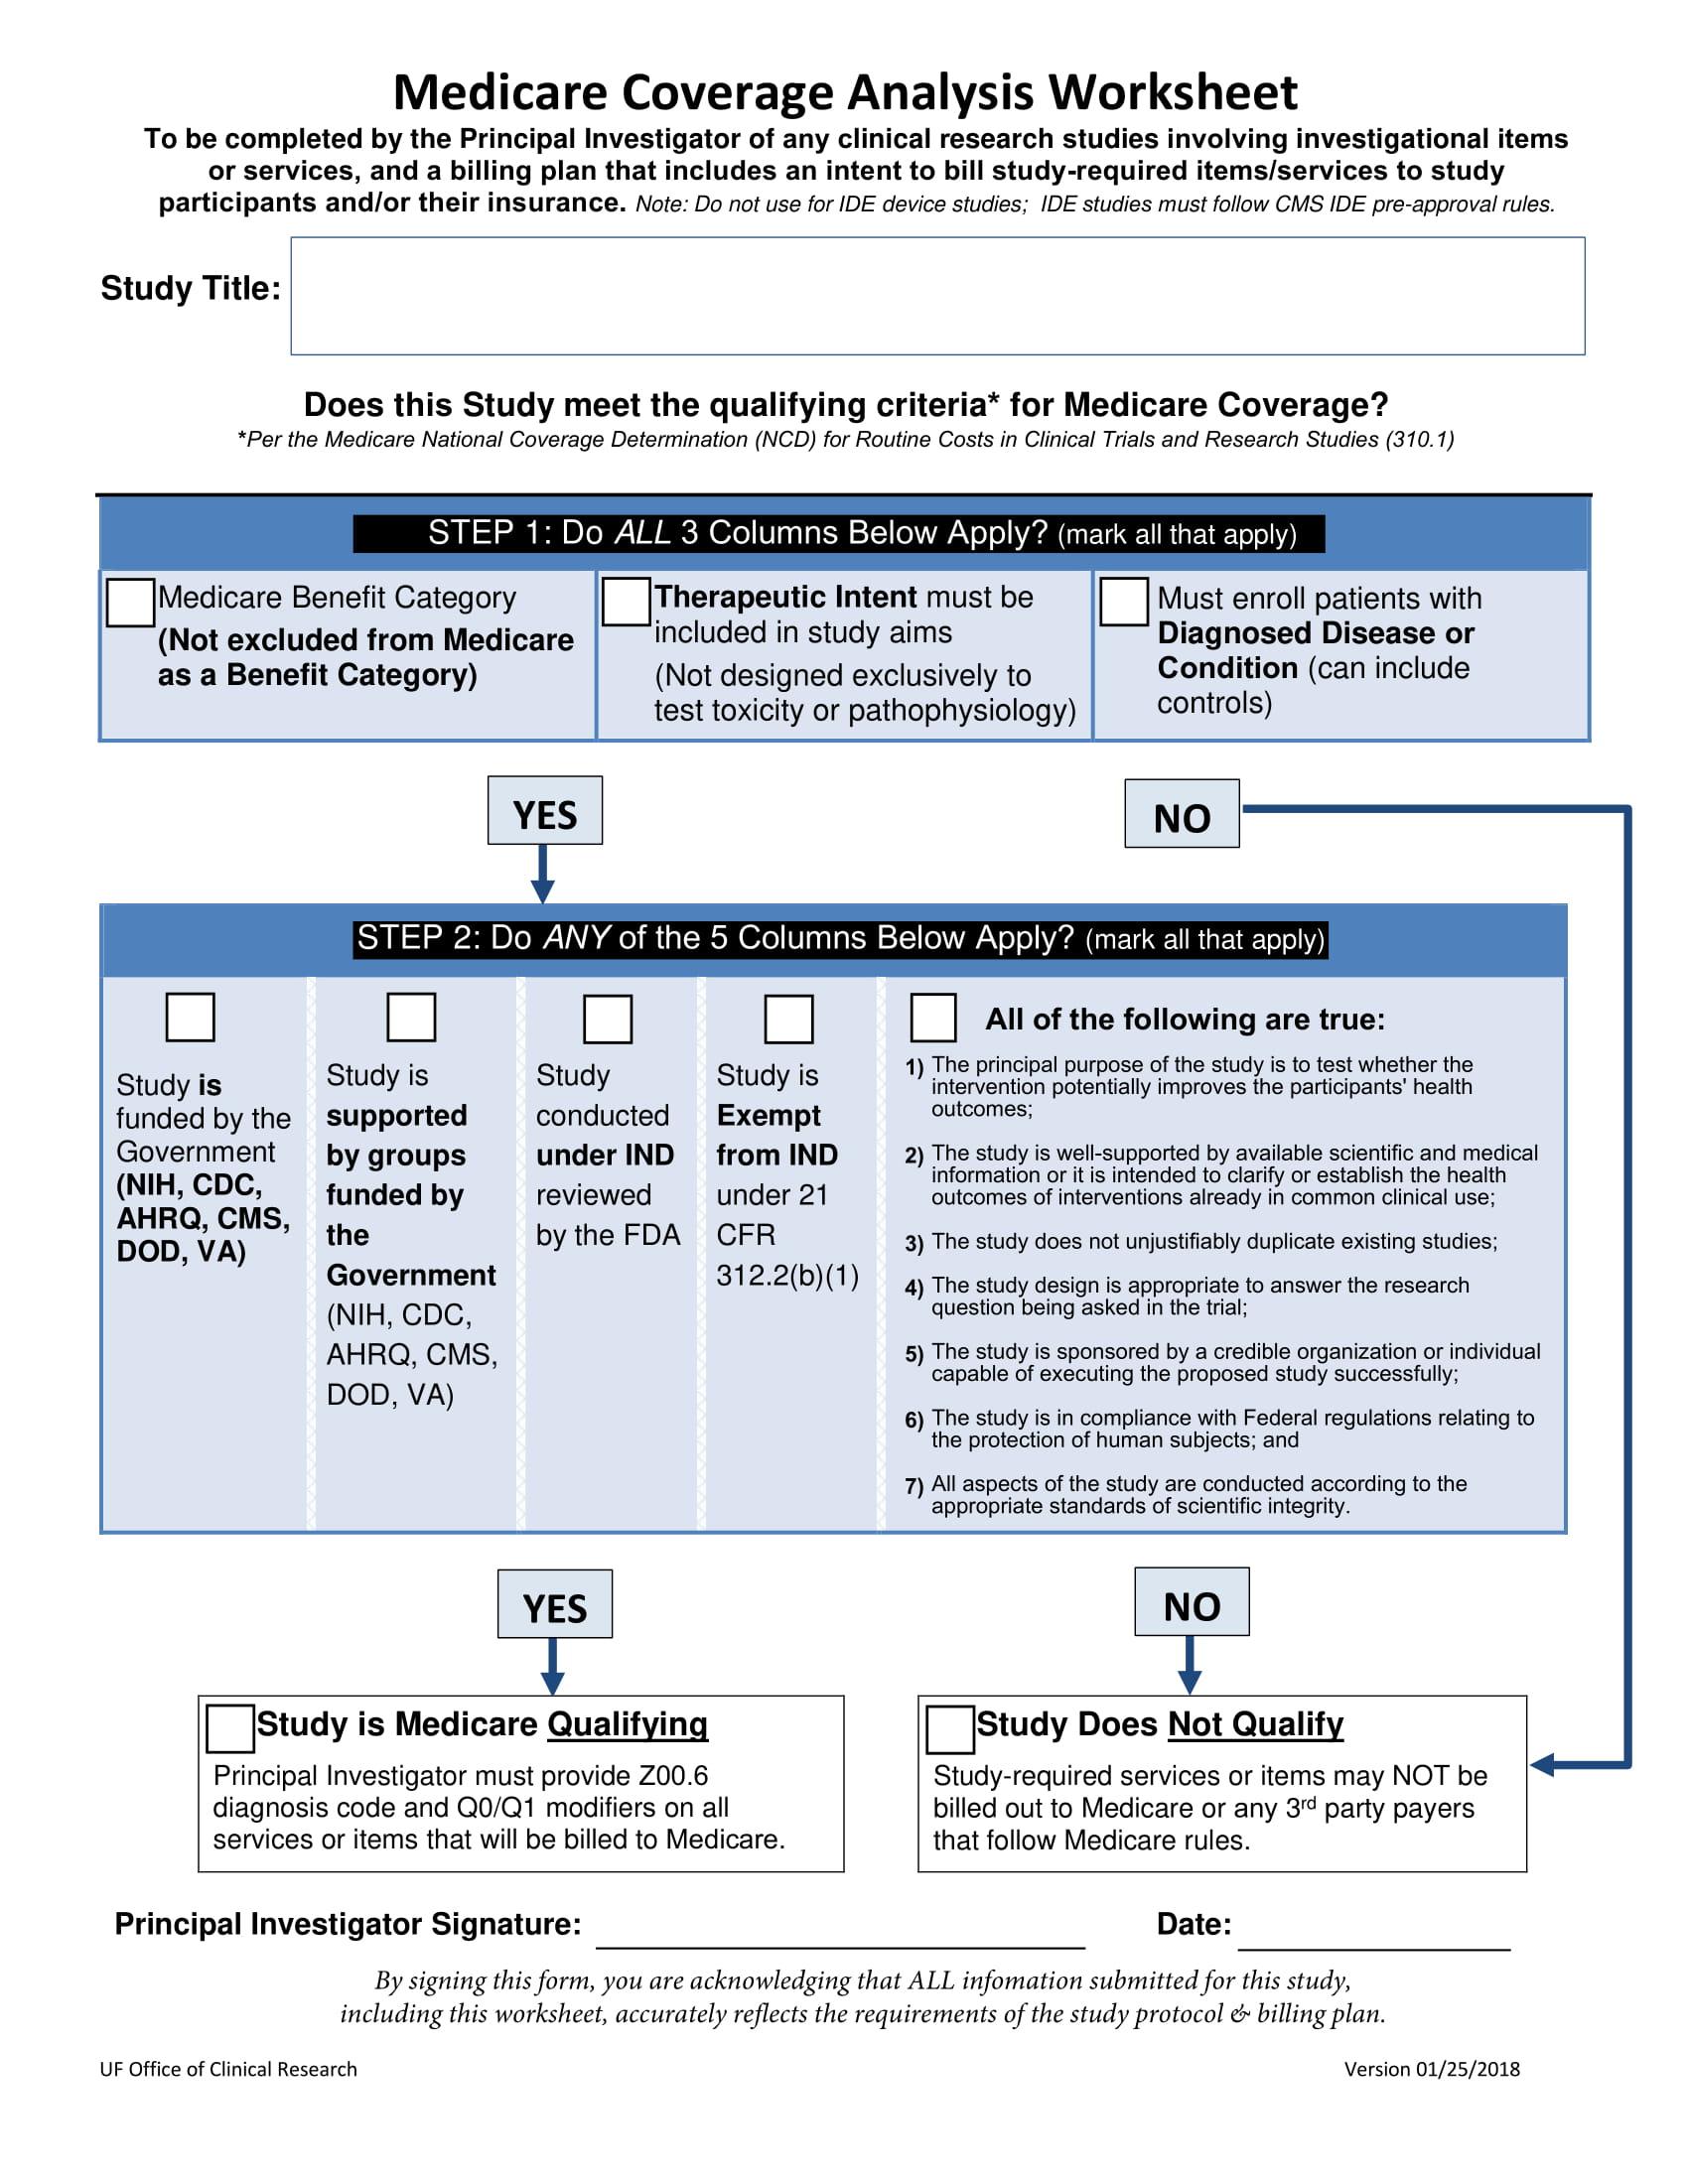 Medicare Coverageysis Worksheet